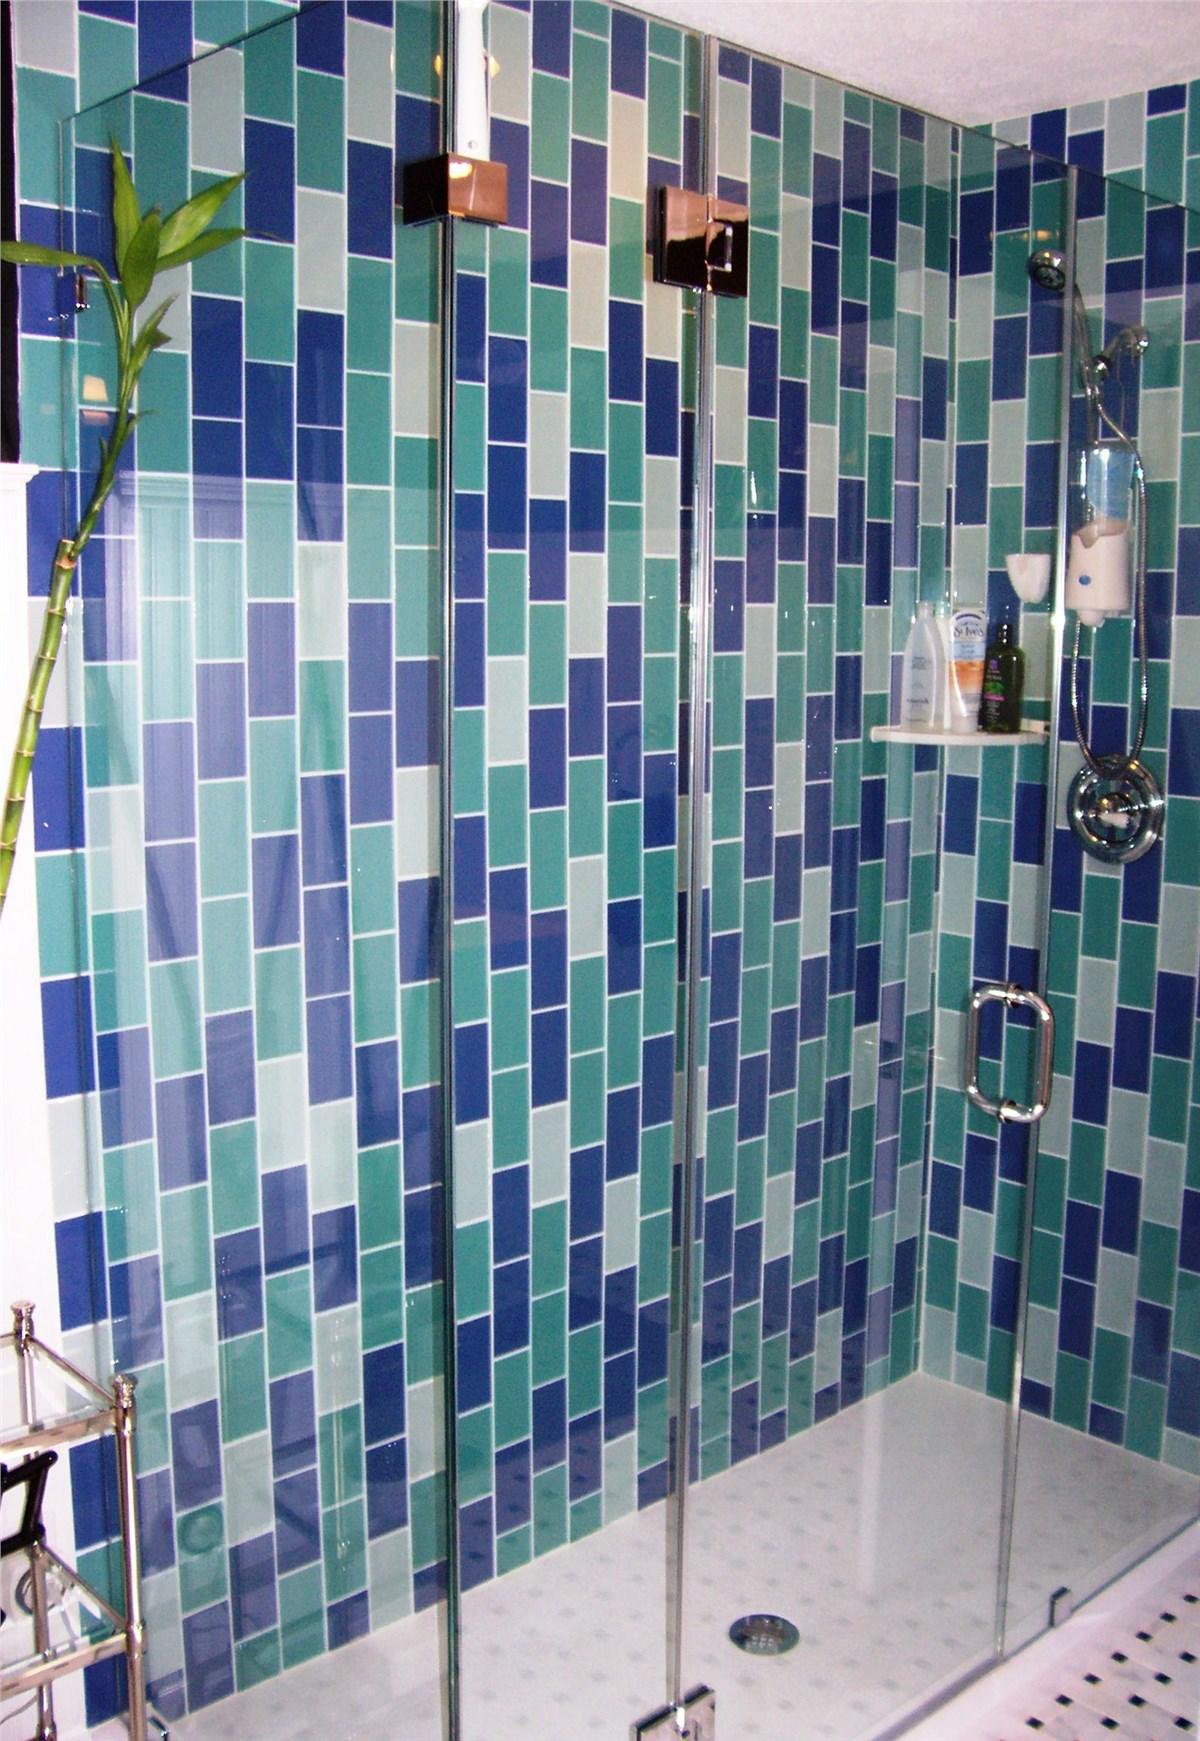 Bathroom Remodelers CT Bath Remodeling Contractors - Bathroom remodel cheshire ct